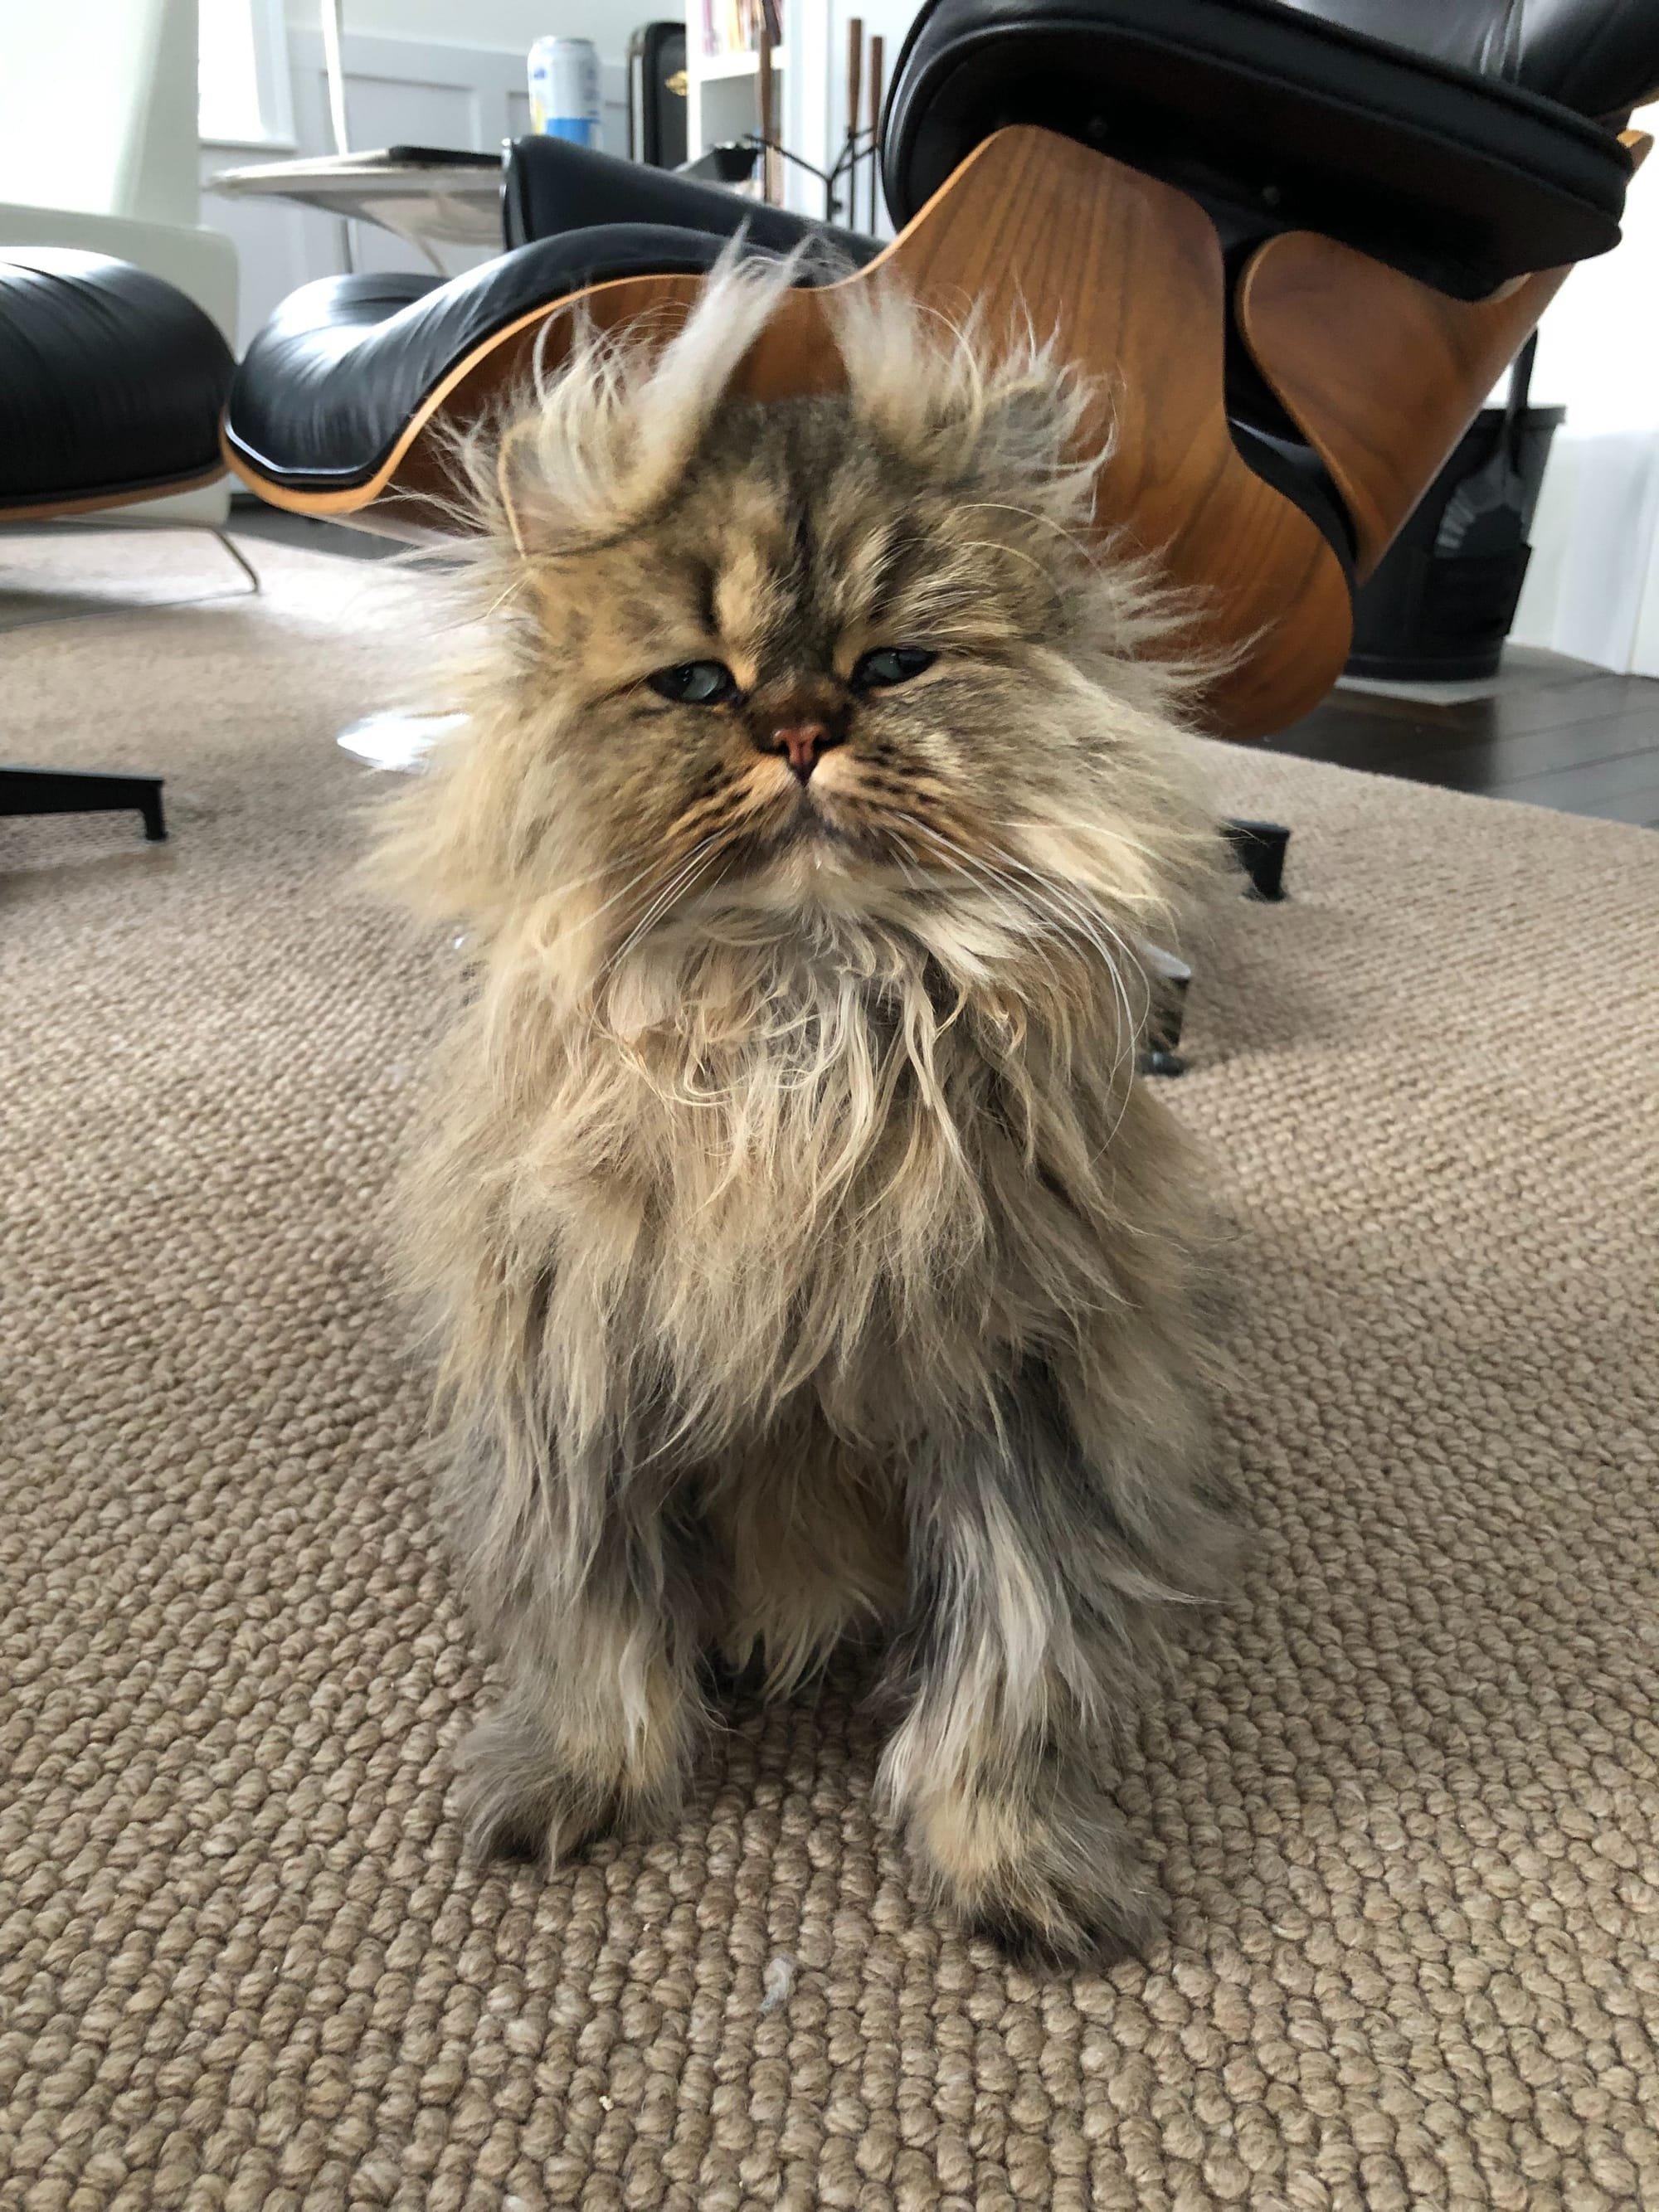 Barnaby the cat